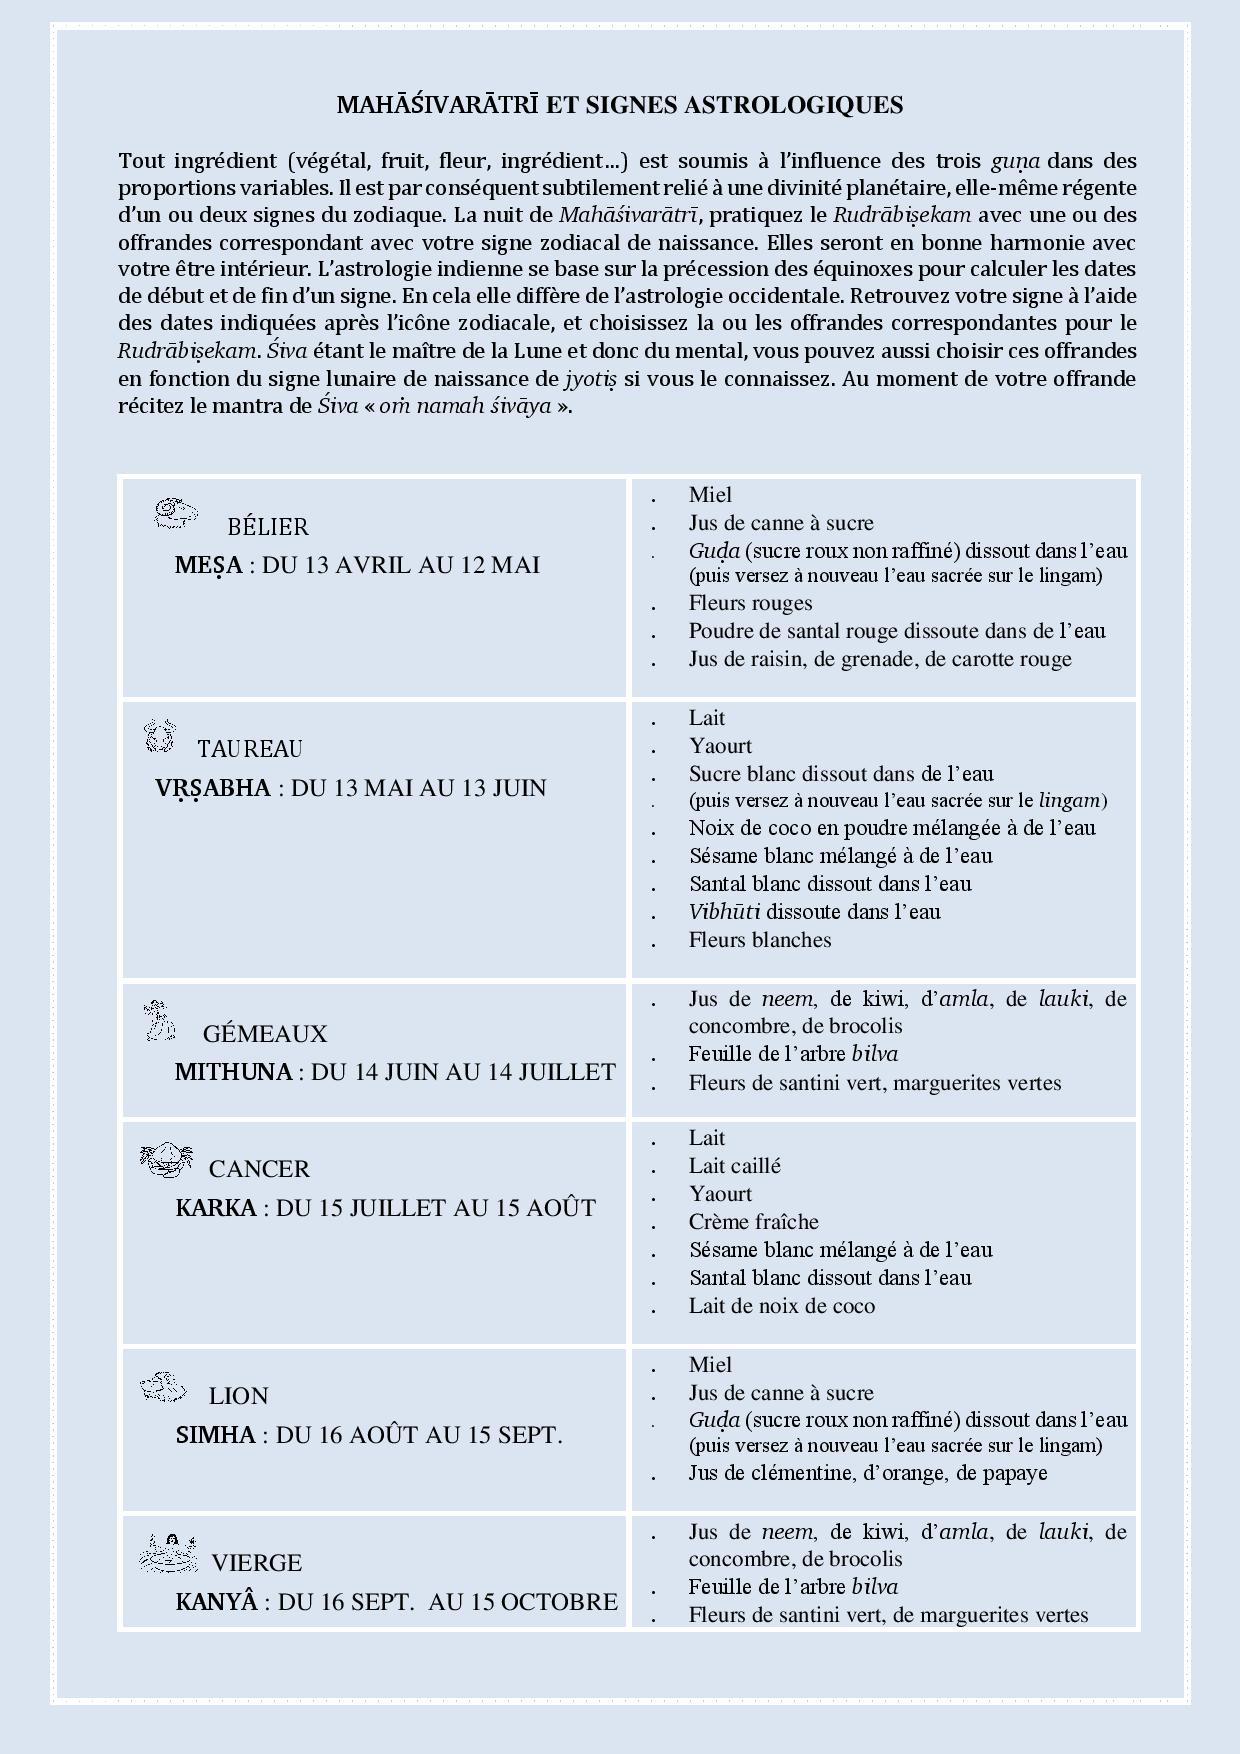 MAHASHIVARATRI 2019 SHIVA 2019-page-005